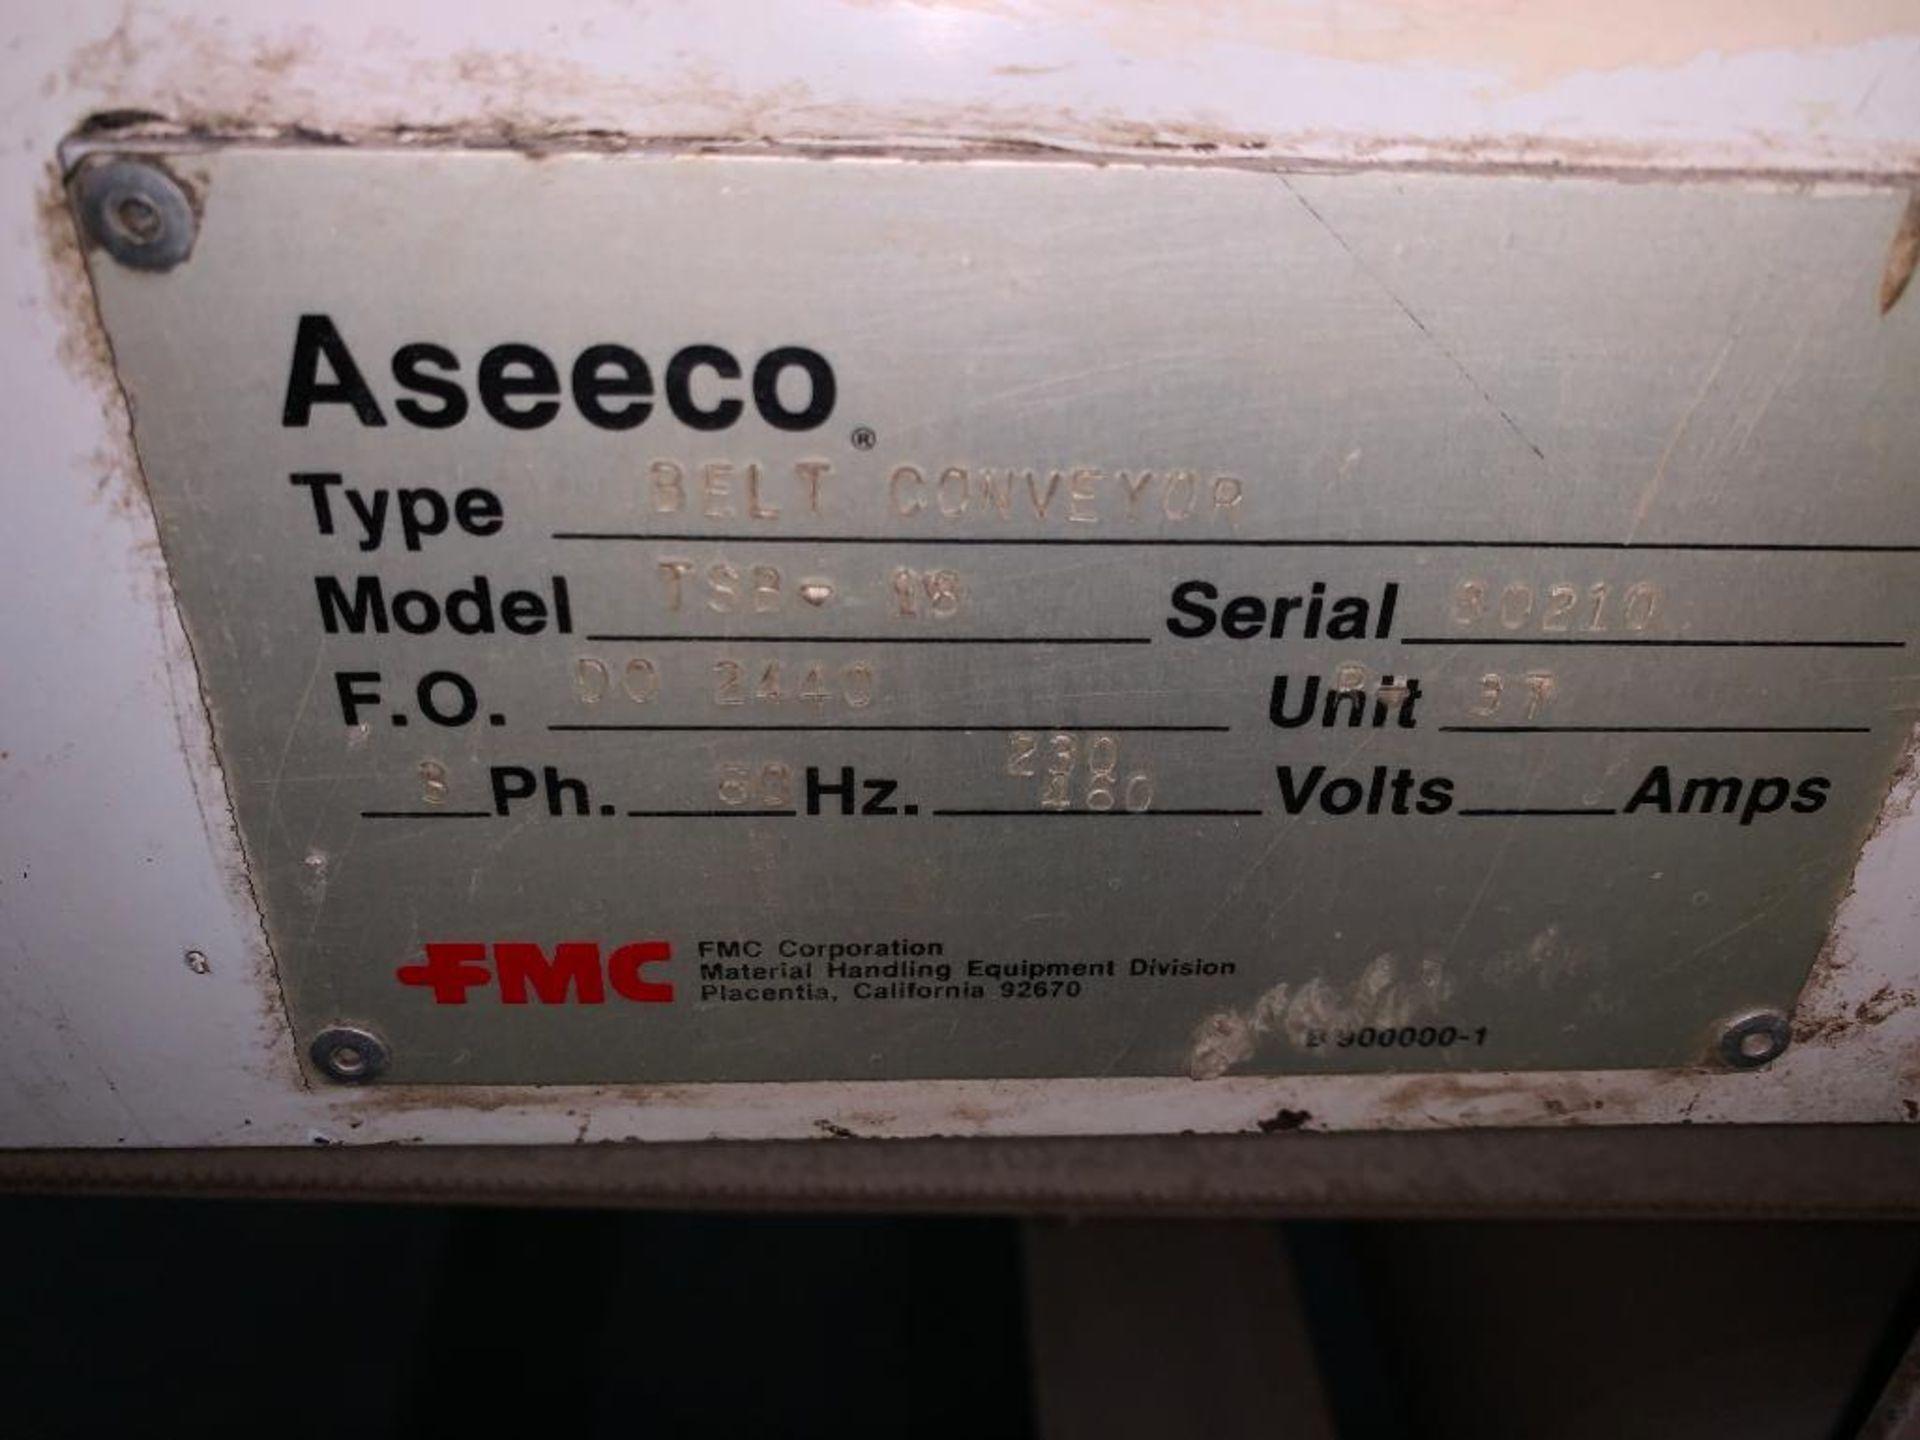 Aseeco mild steel cone bottom bulk storage bin - Image 24 of 27